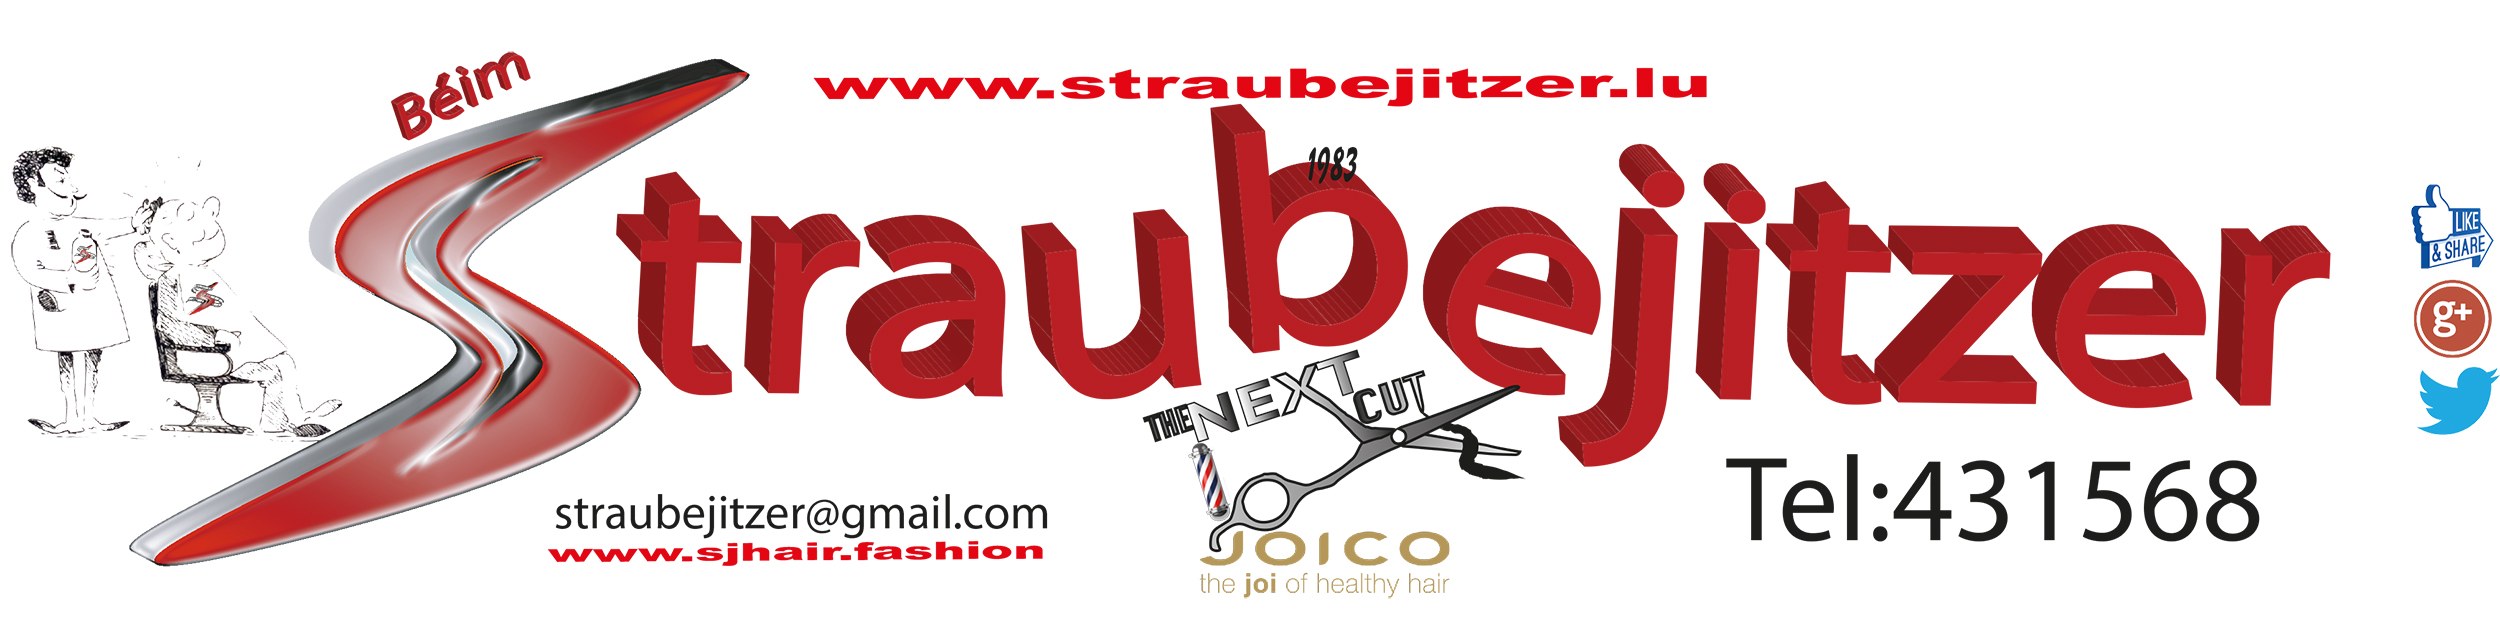 LOGO Publicitaire logo 2017 Kopie